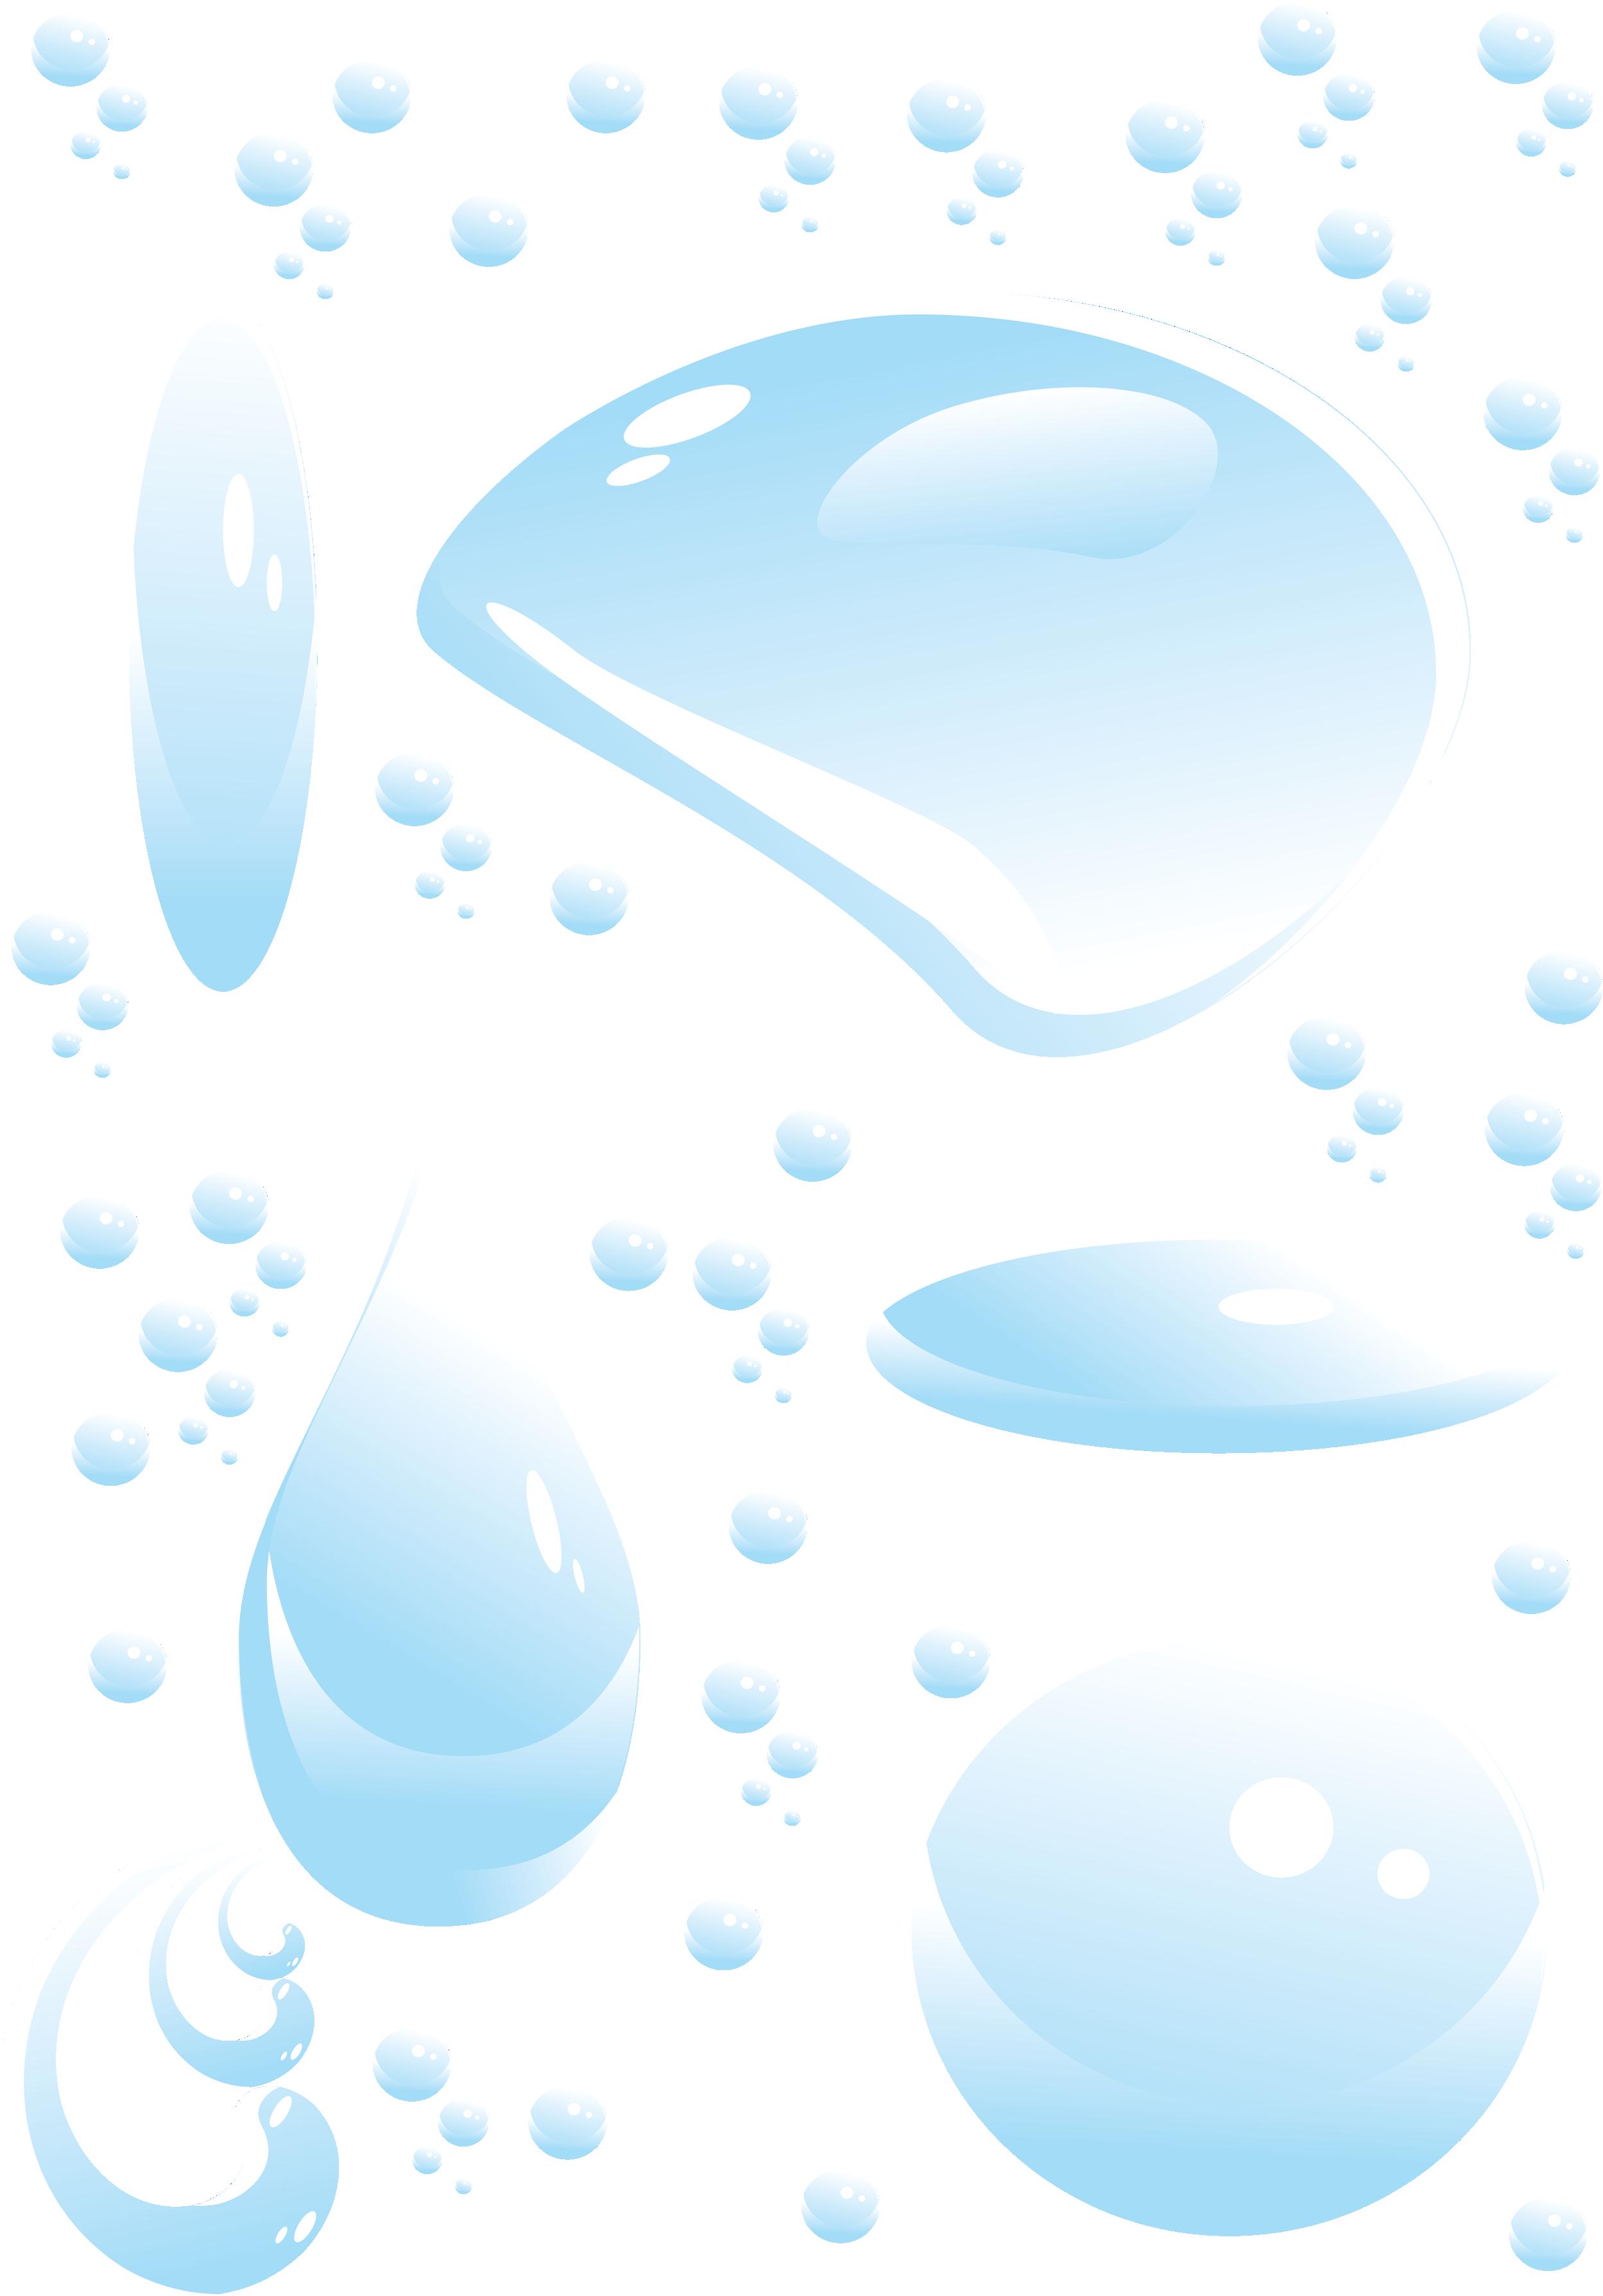 Water drops PNG image  Water drops PNG image